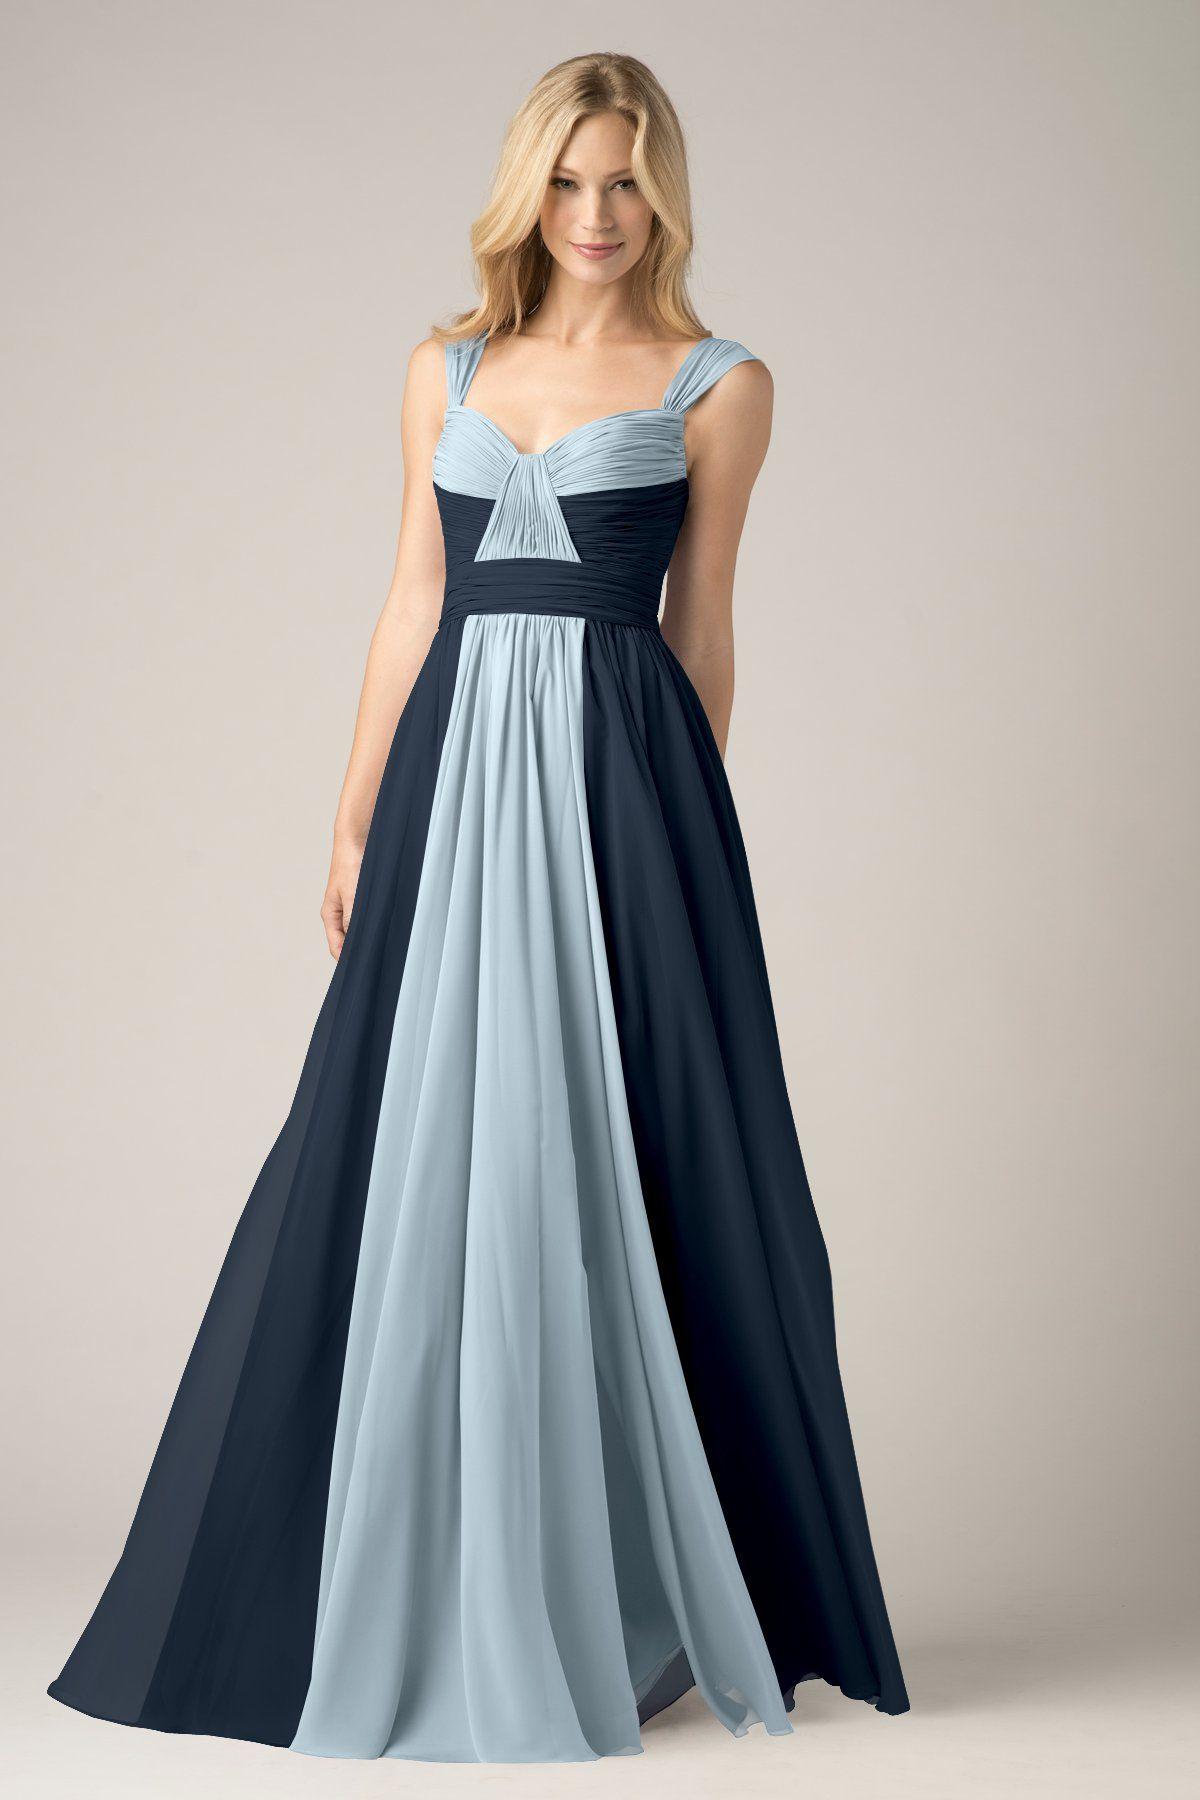 807 | Bridesmaids | Wtoo by Watters | Mazel Tov! | Pinterest